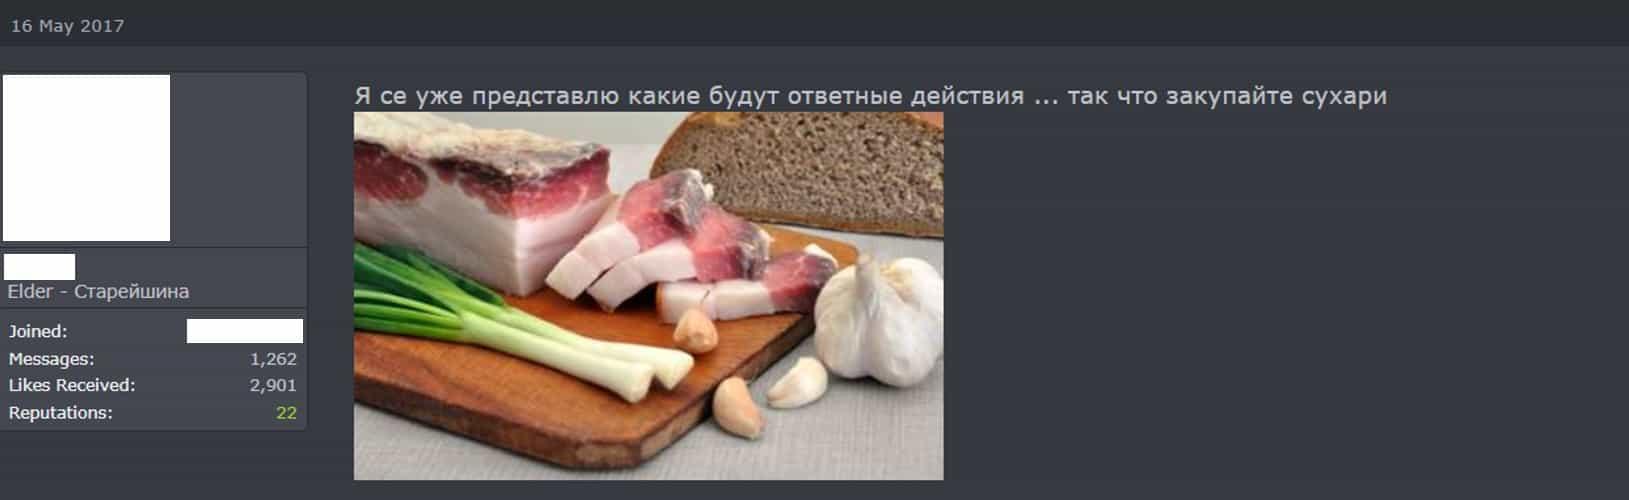 Forum user prepares to receive slurs in response to their previous Ukrainian-language post